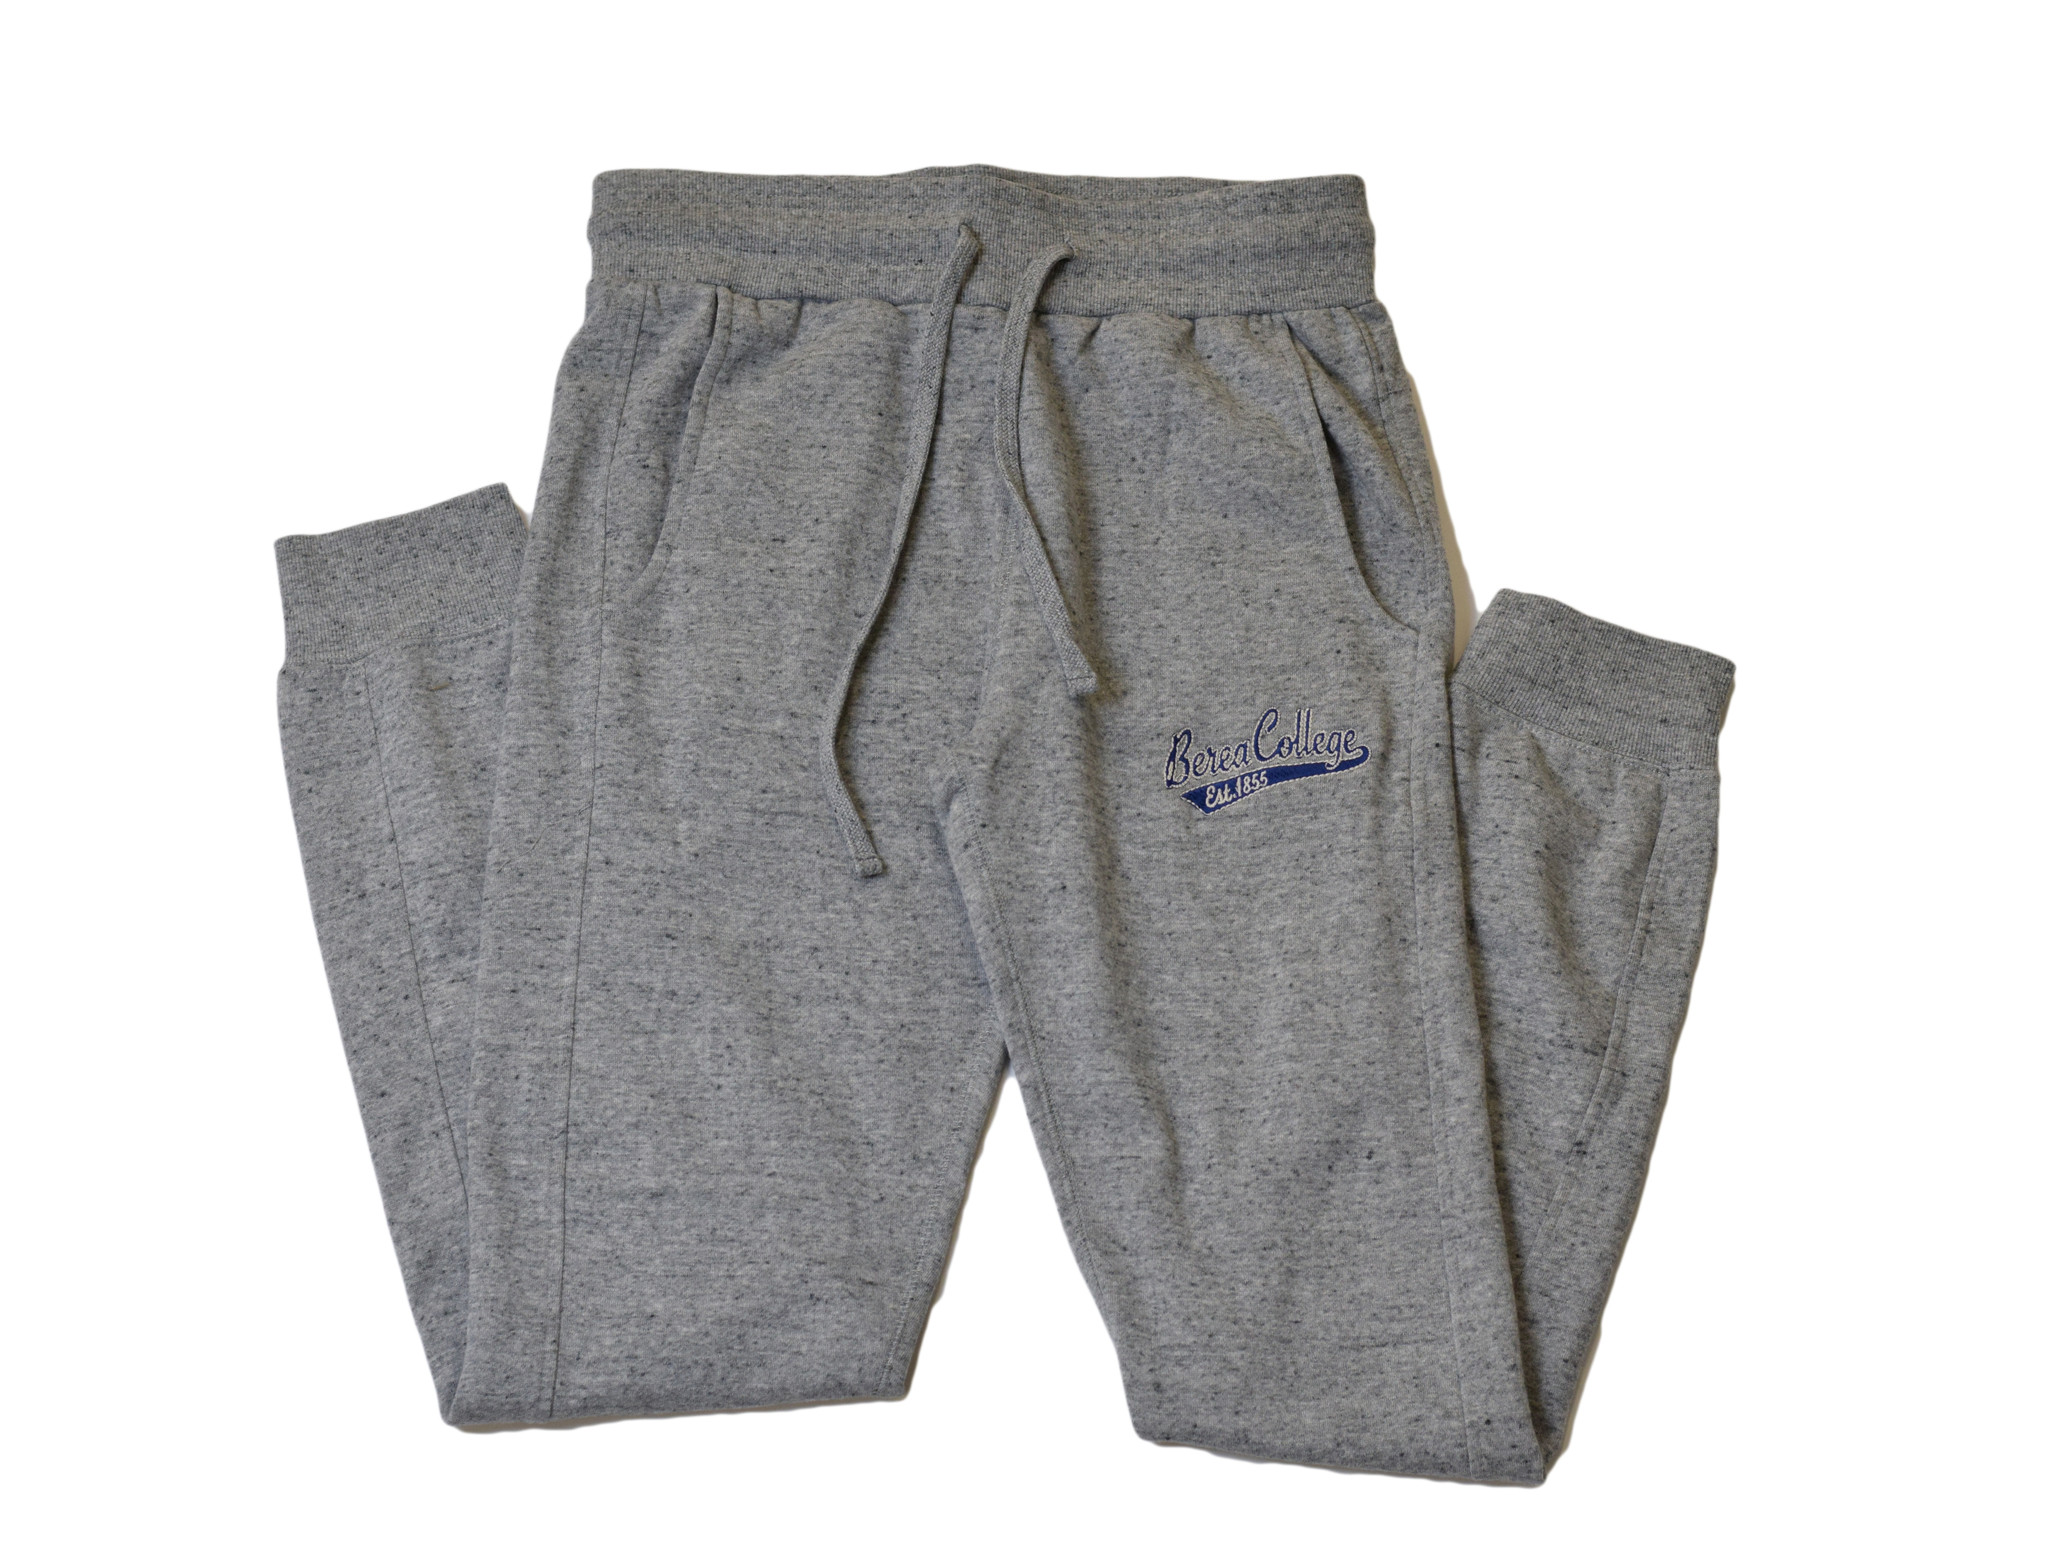 Heather Berea College 1855 sweatpants-1